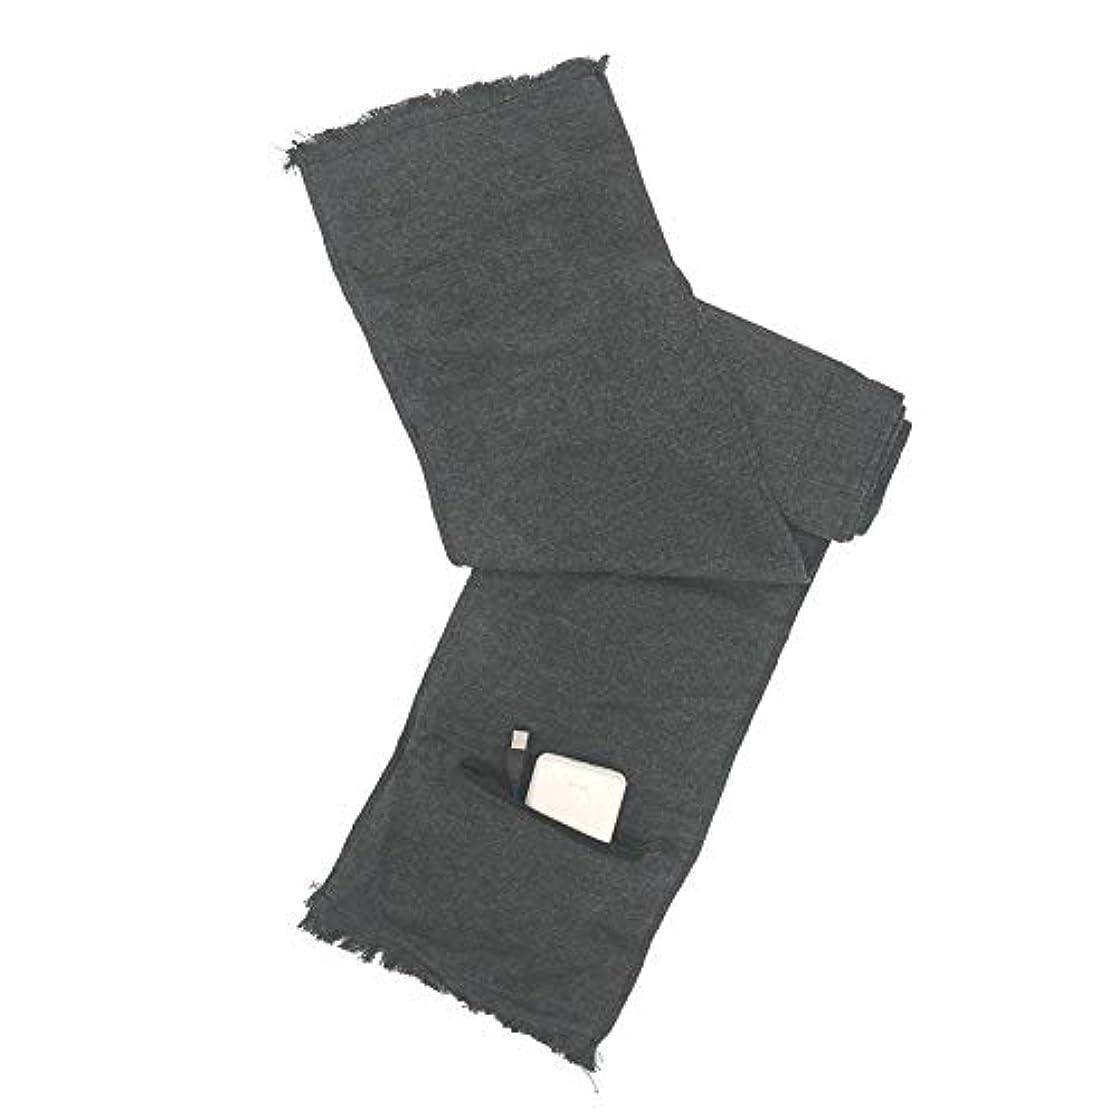 祈る現代猛烈なSund 電気加熱マフラー 冬用 加熱スカーフ USB充電式 遠赤外線 発熱効果 男女兼用 通勤通学 室外作業